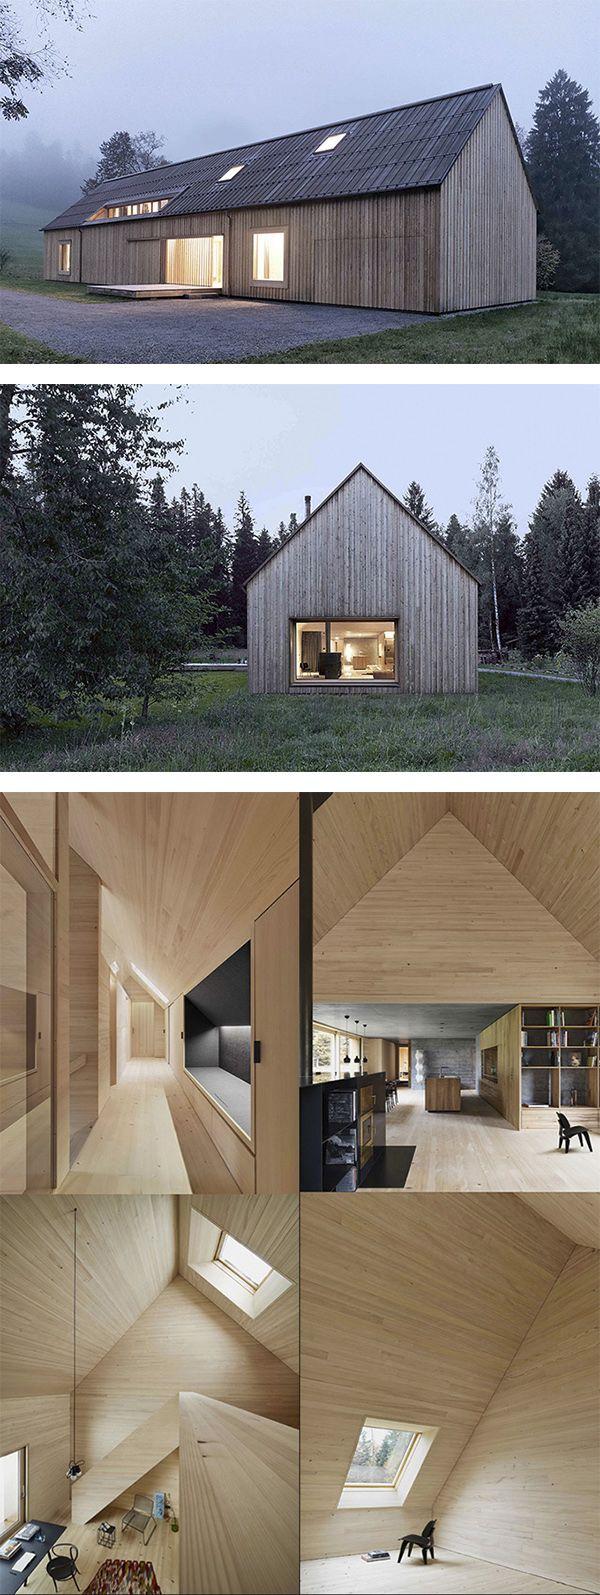 Exterior: Haus Am Moor By The Austrian Architect Bernardo Bader